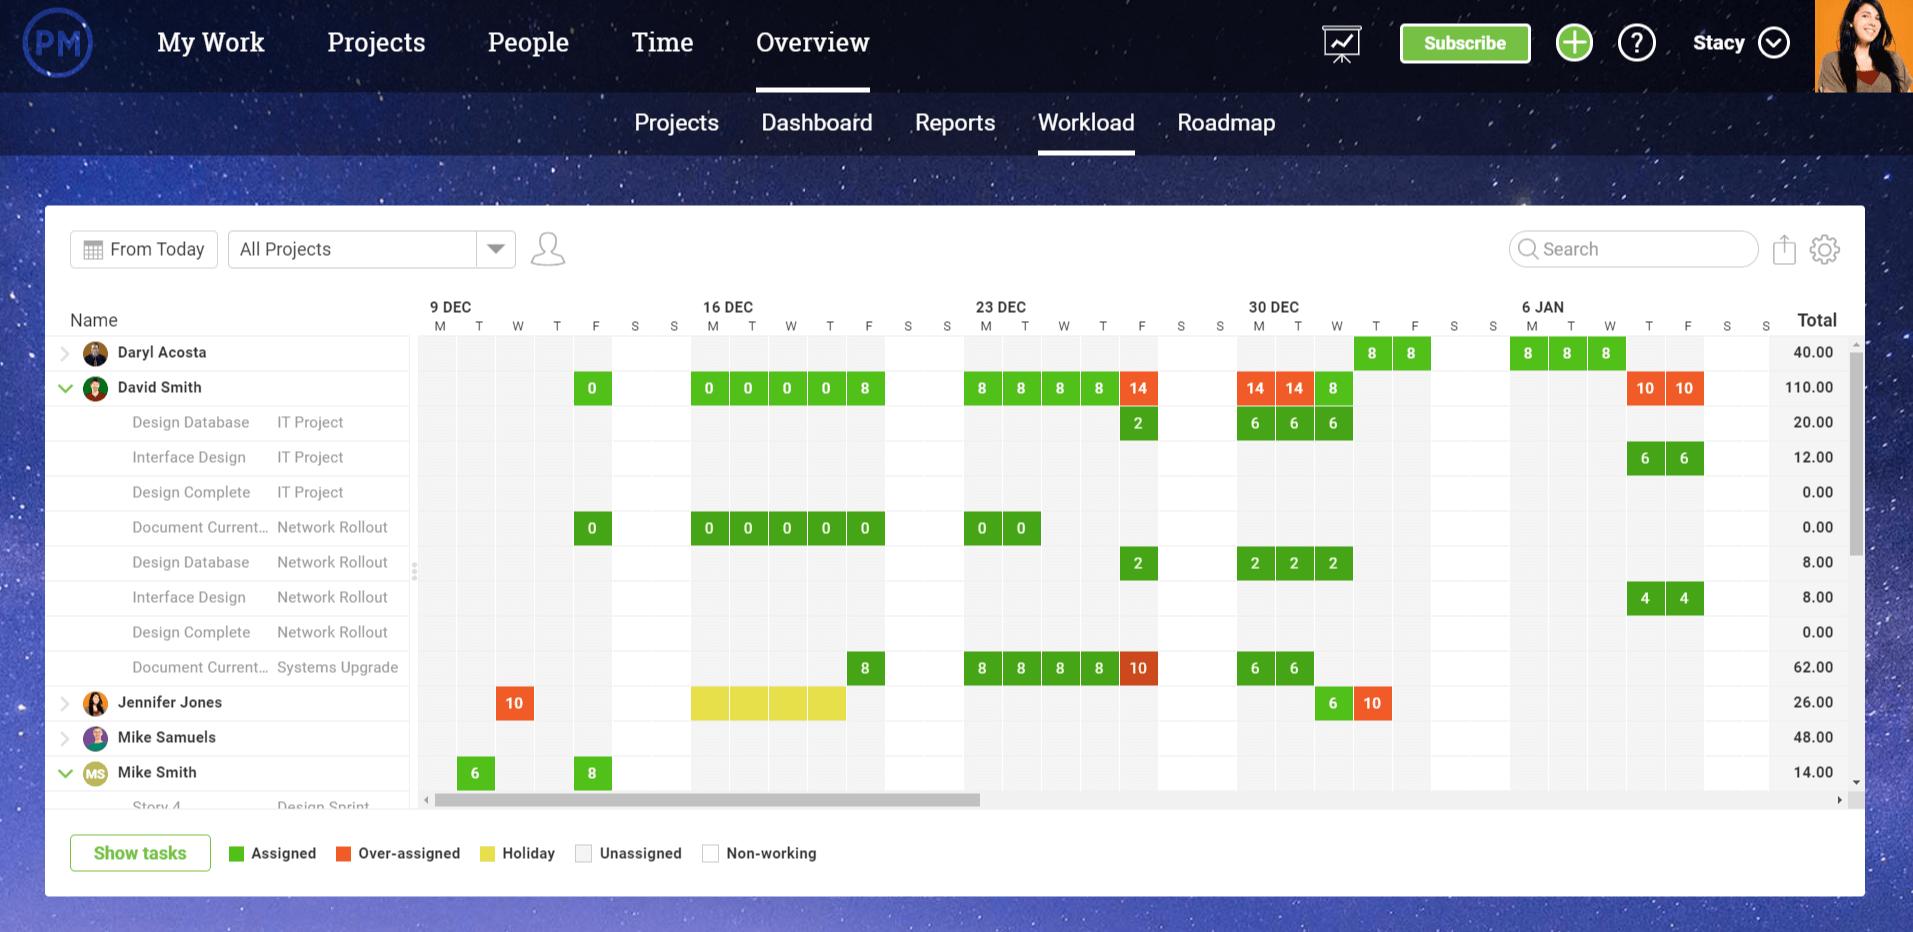 captura de pantalla de la página de carga de trabajo en ProjectManager.com